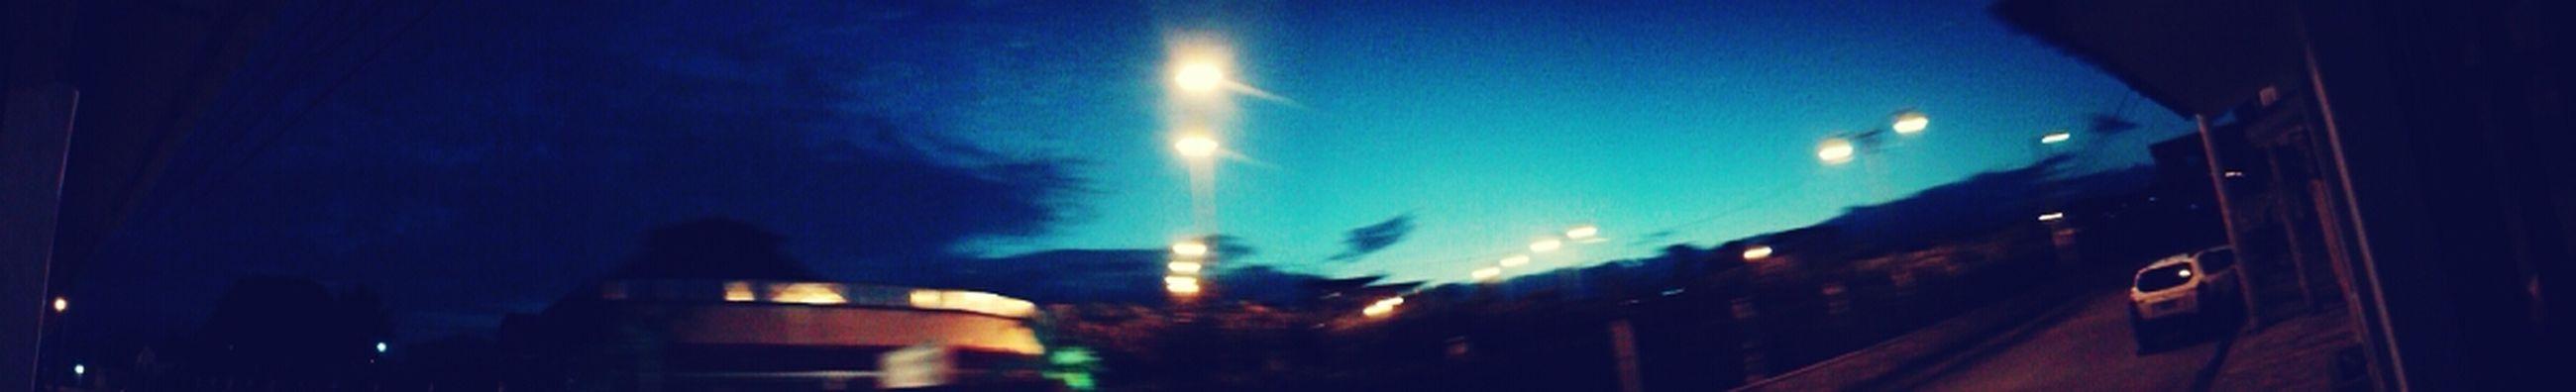 asi luce hoy l cielo son las 6 y 40 pm pero parece q va a llover mas.fuerte q ayer.. Sunset